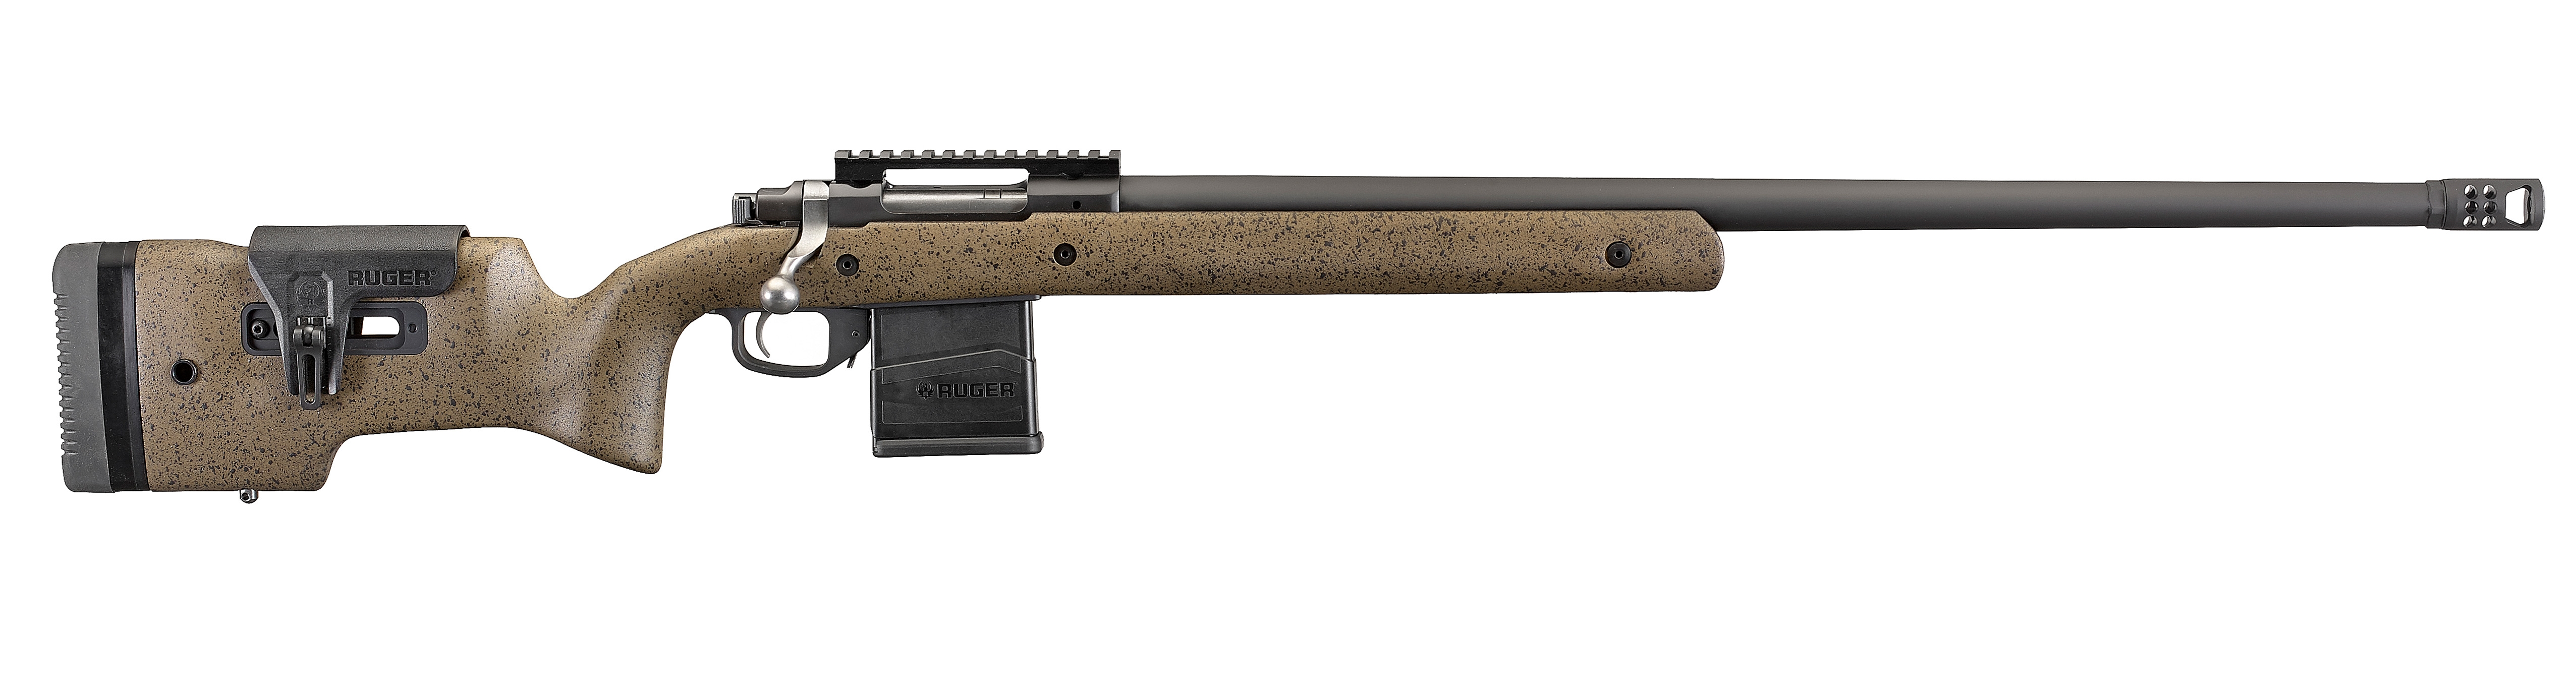 Ruger M77 Hawkeye Long Range Target 308 Win